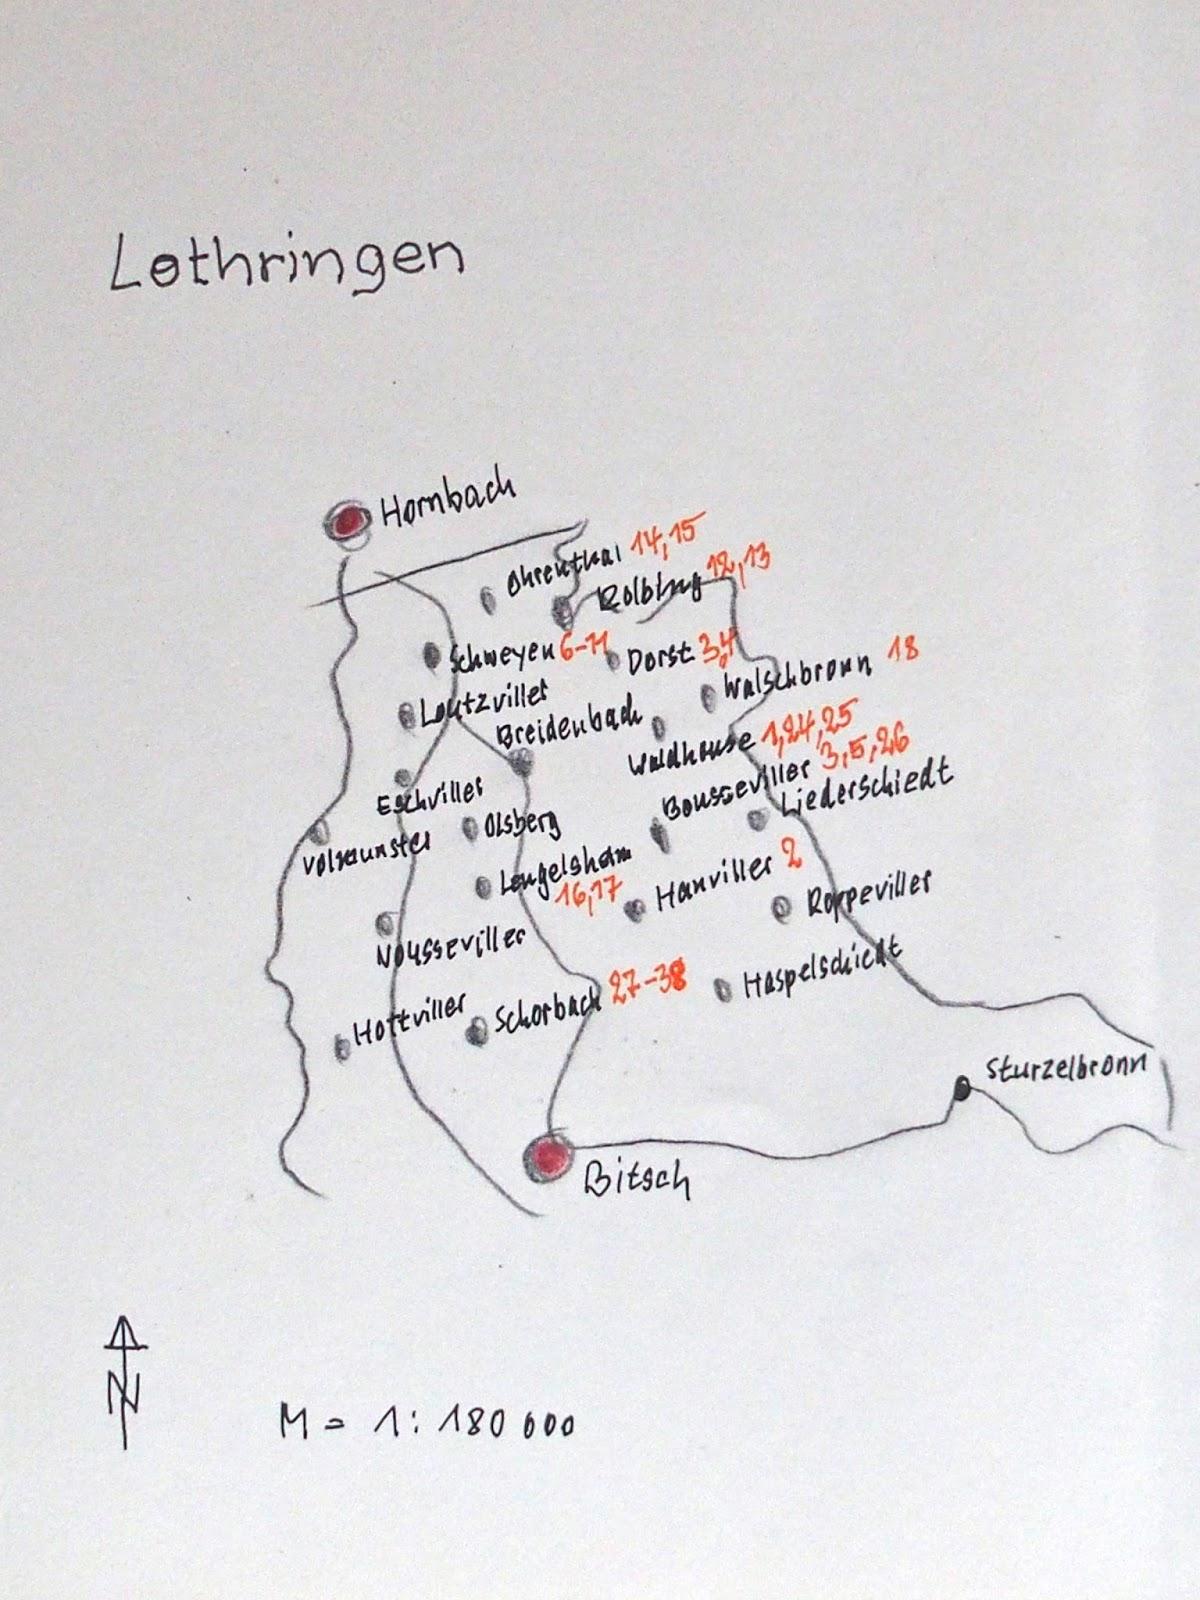 Kreuzwege - Wegkreuze